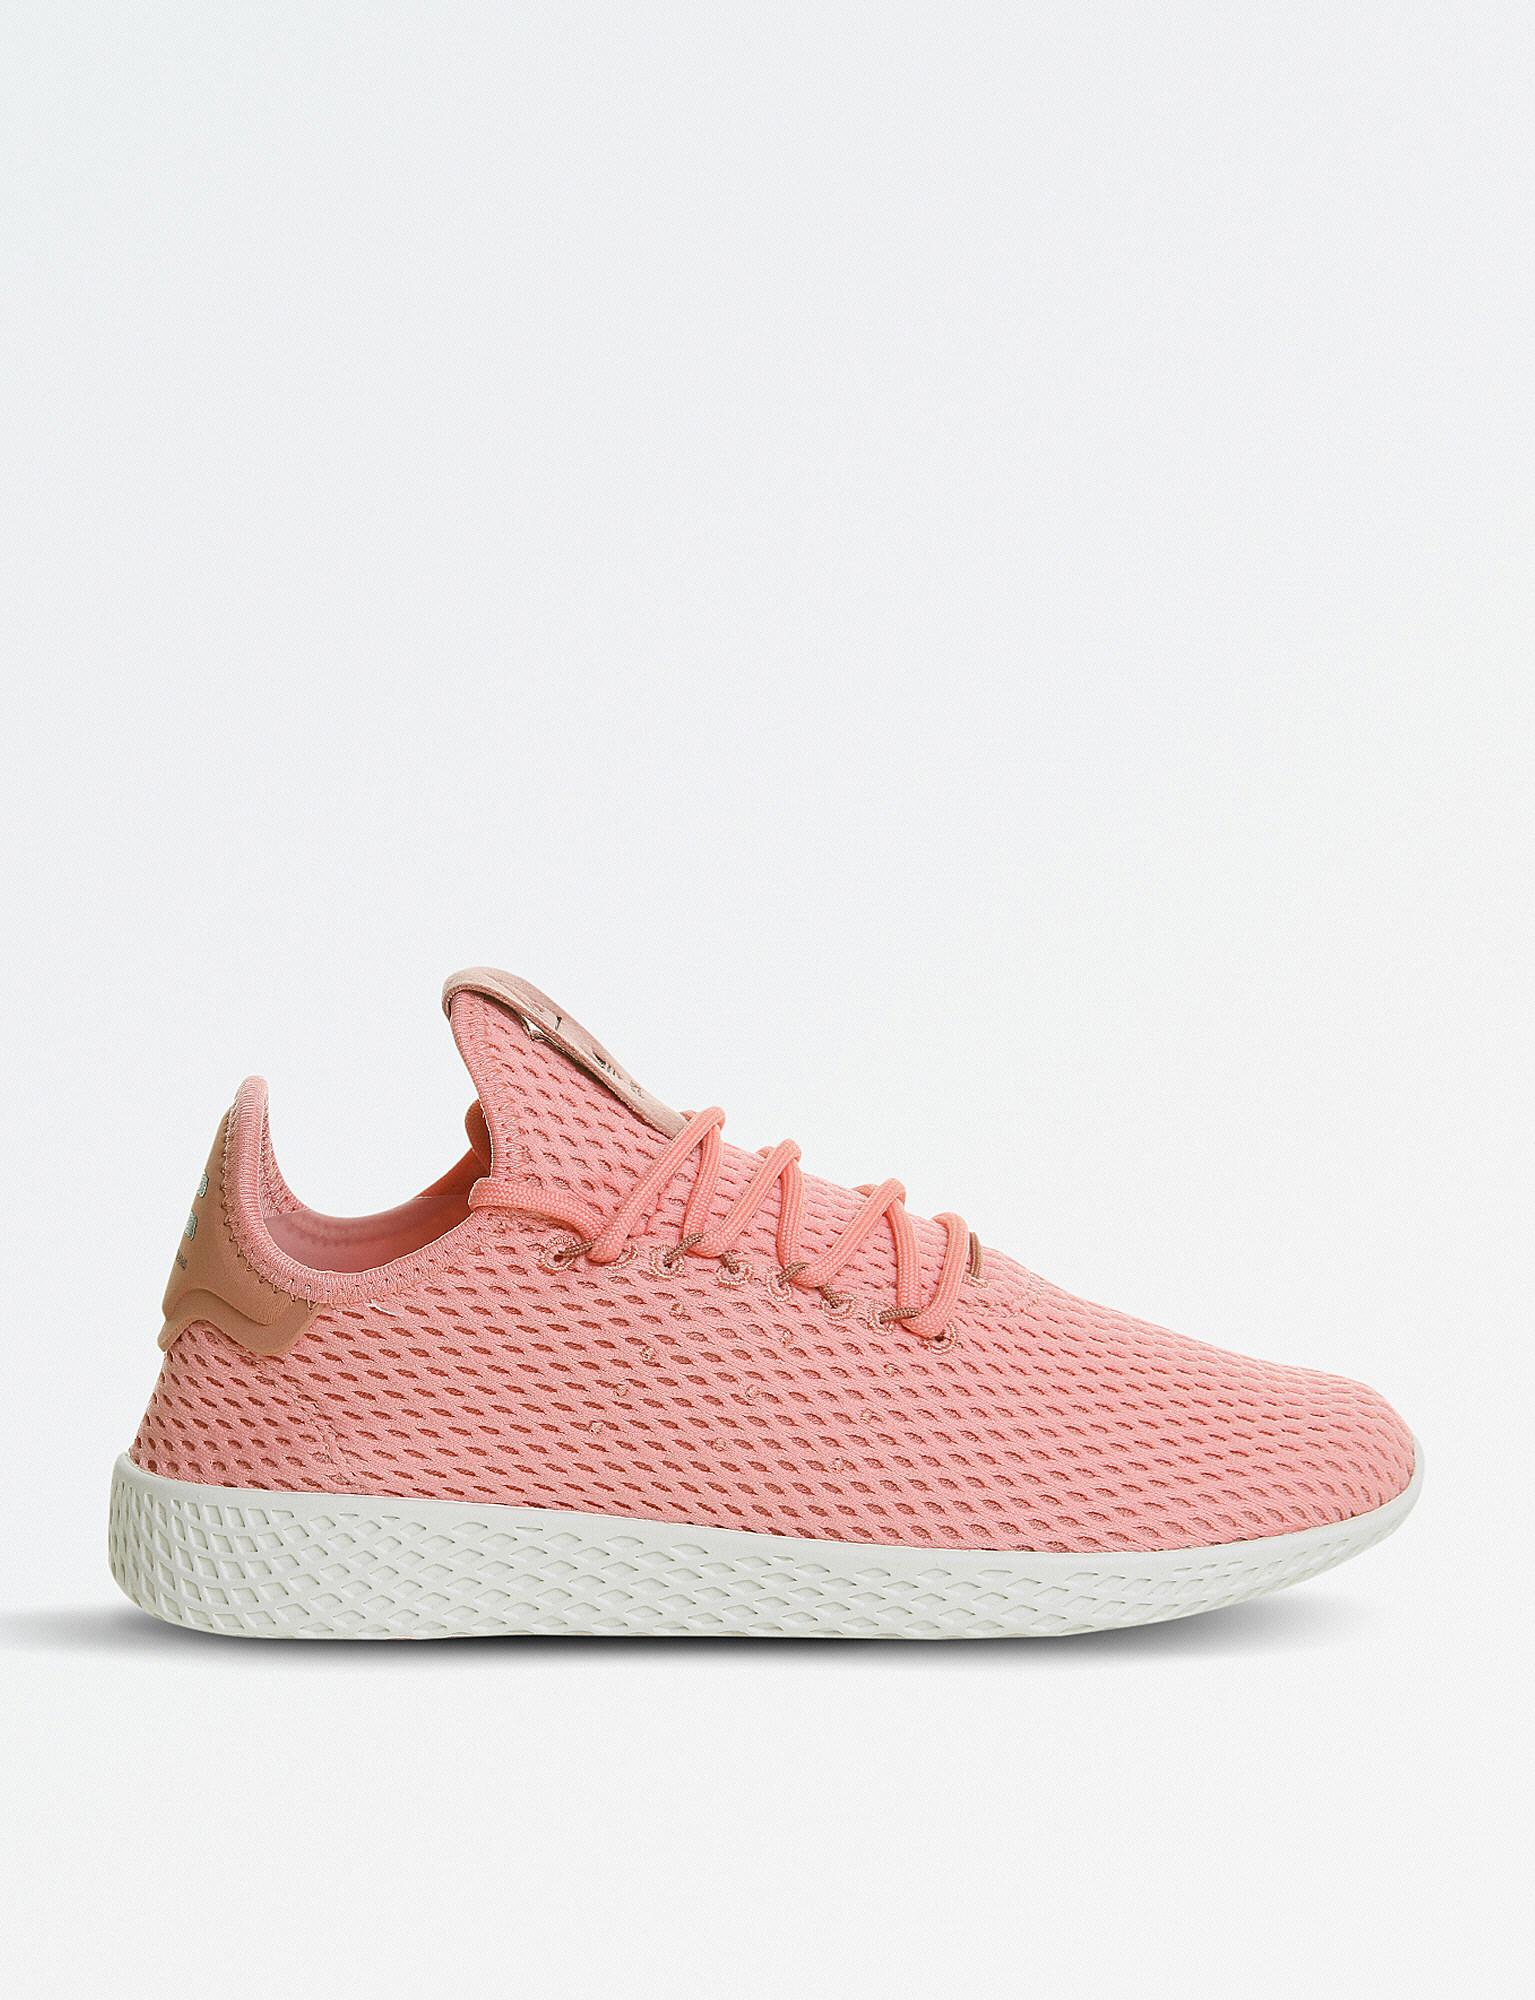 Pais de Ciudadania Patatas sin embargo  adidas Pharrell Williams Tennis Hu Mesh Trainers in Pink - Lyst